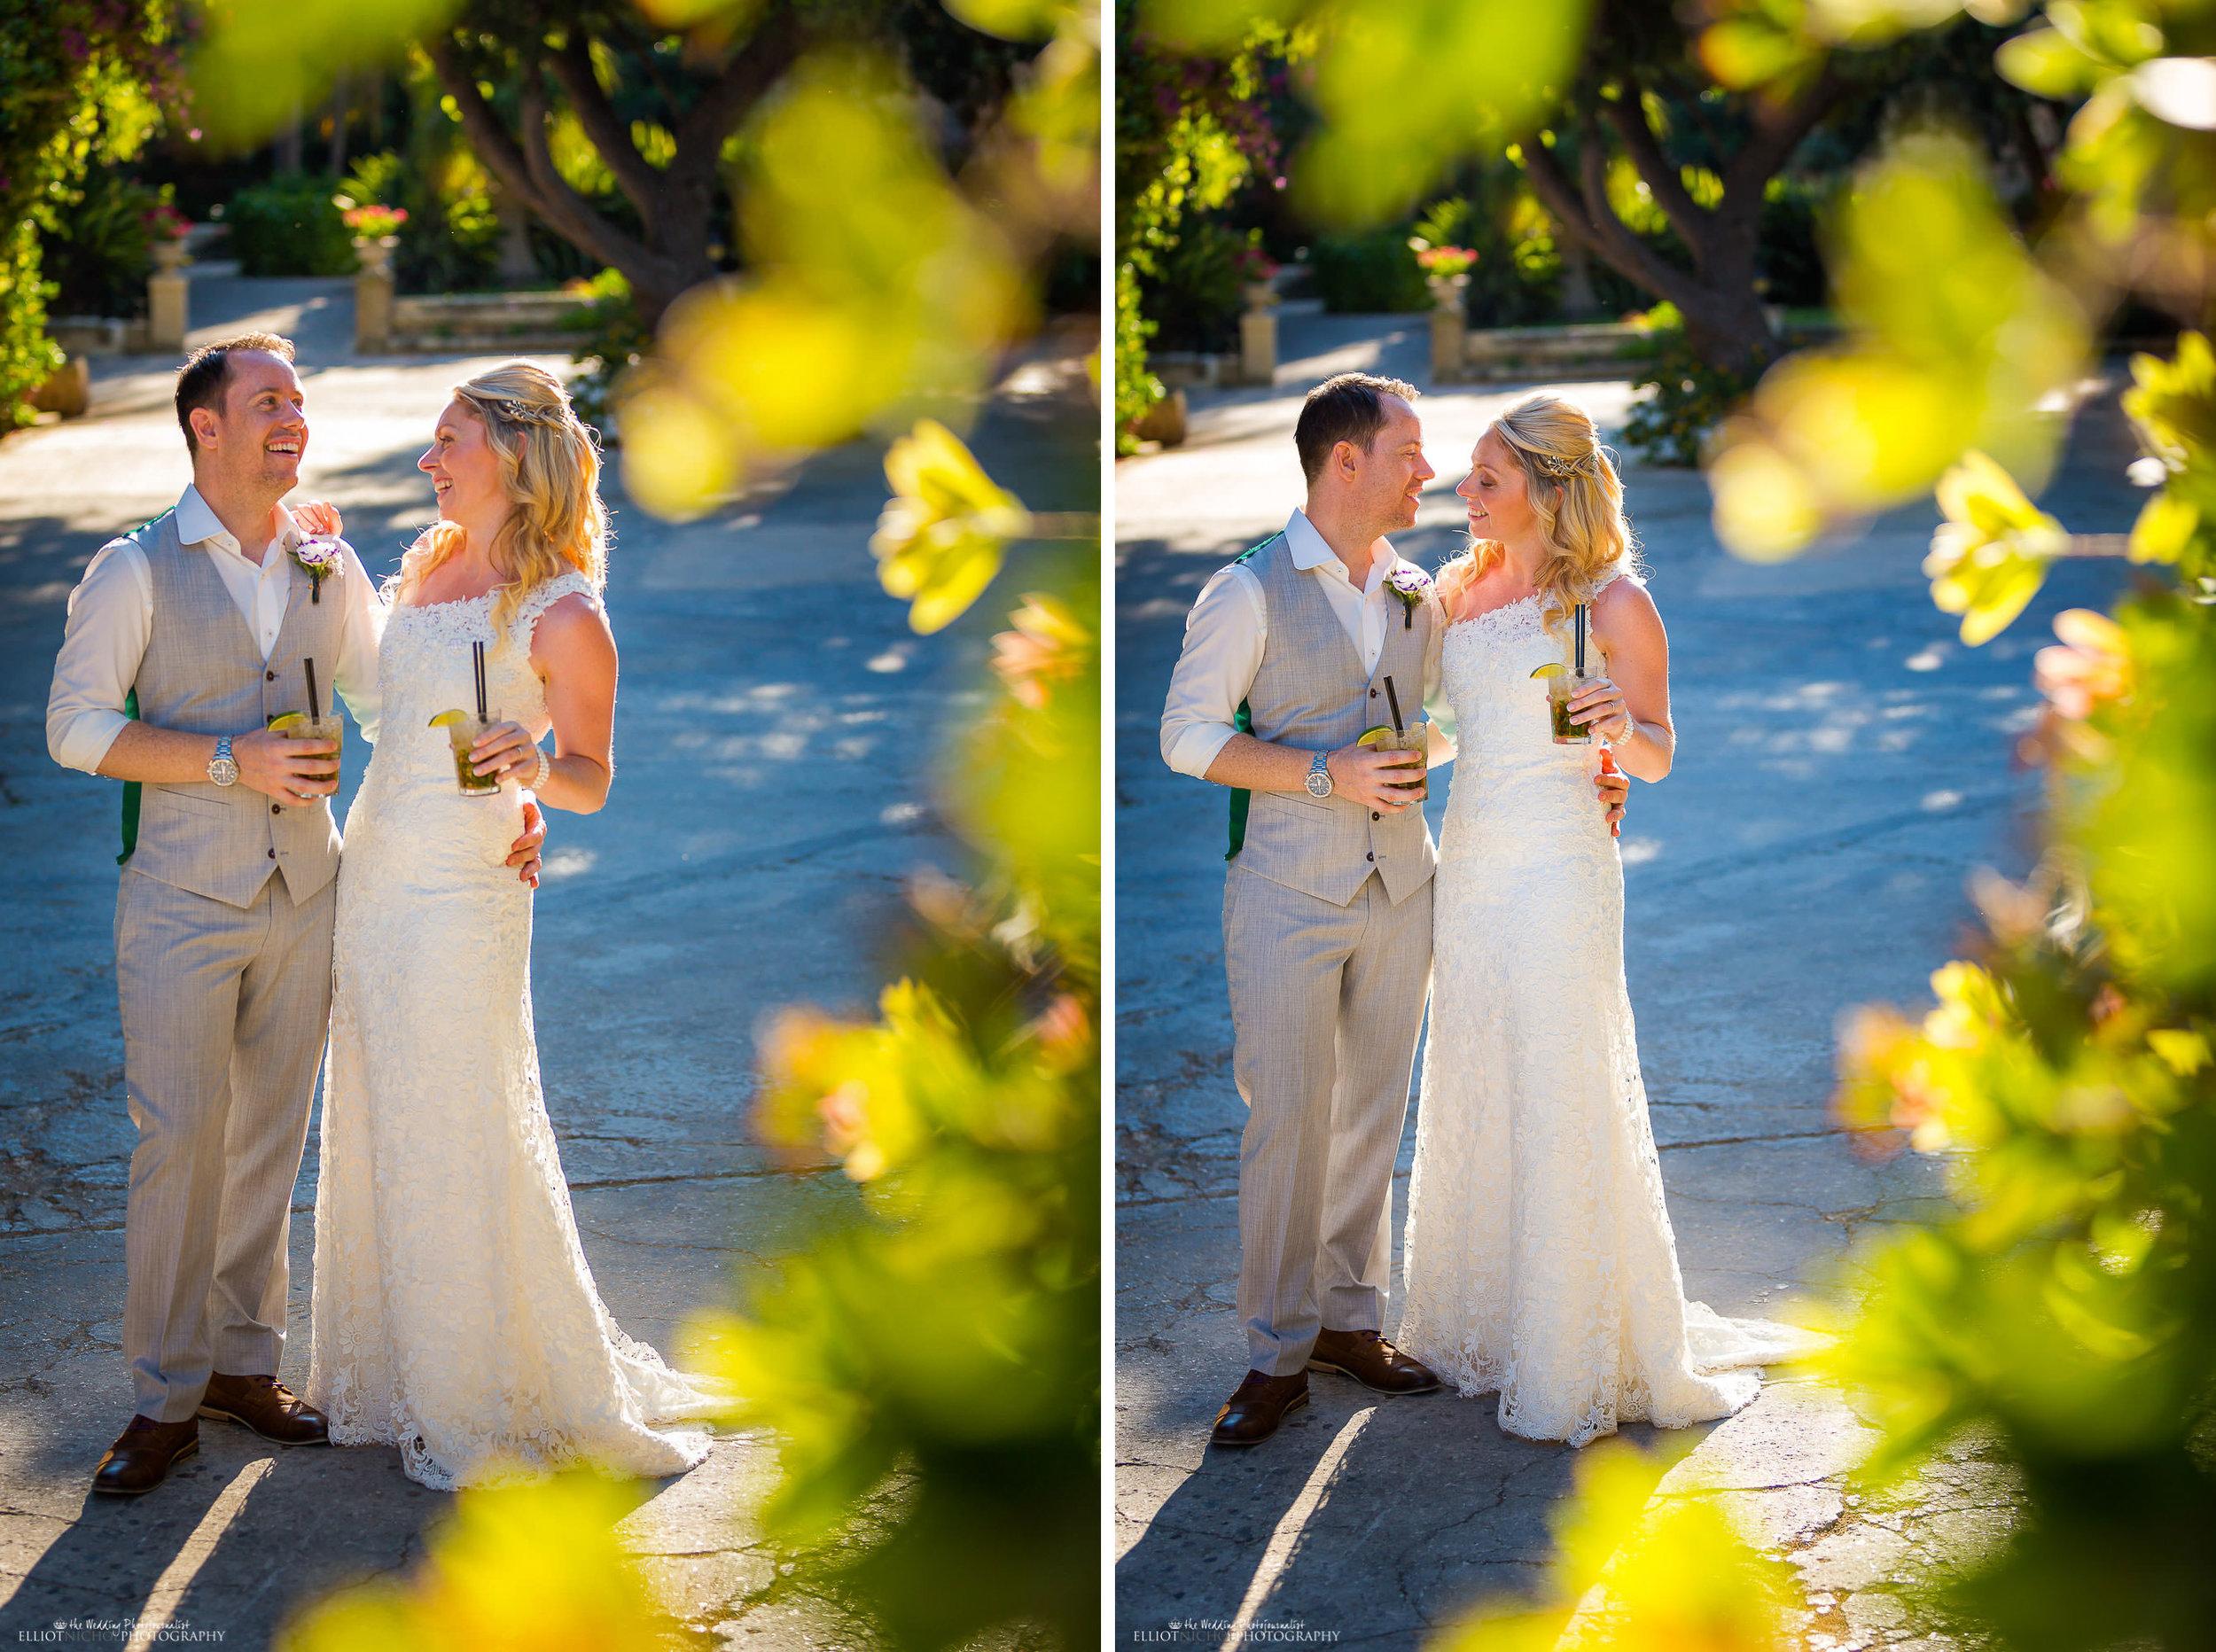 relaxed-bride-groom-portrait-wedding-photography-destination-weddings